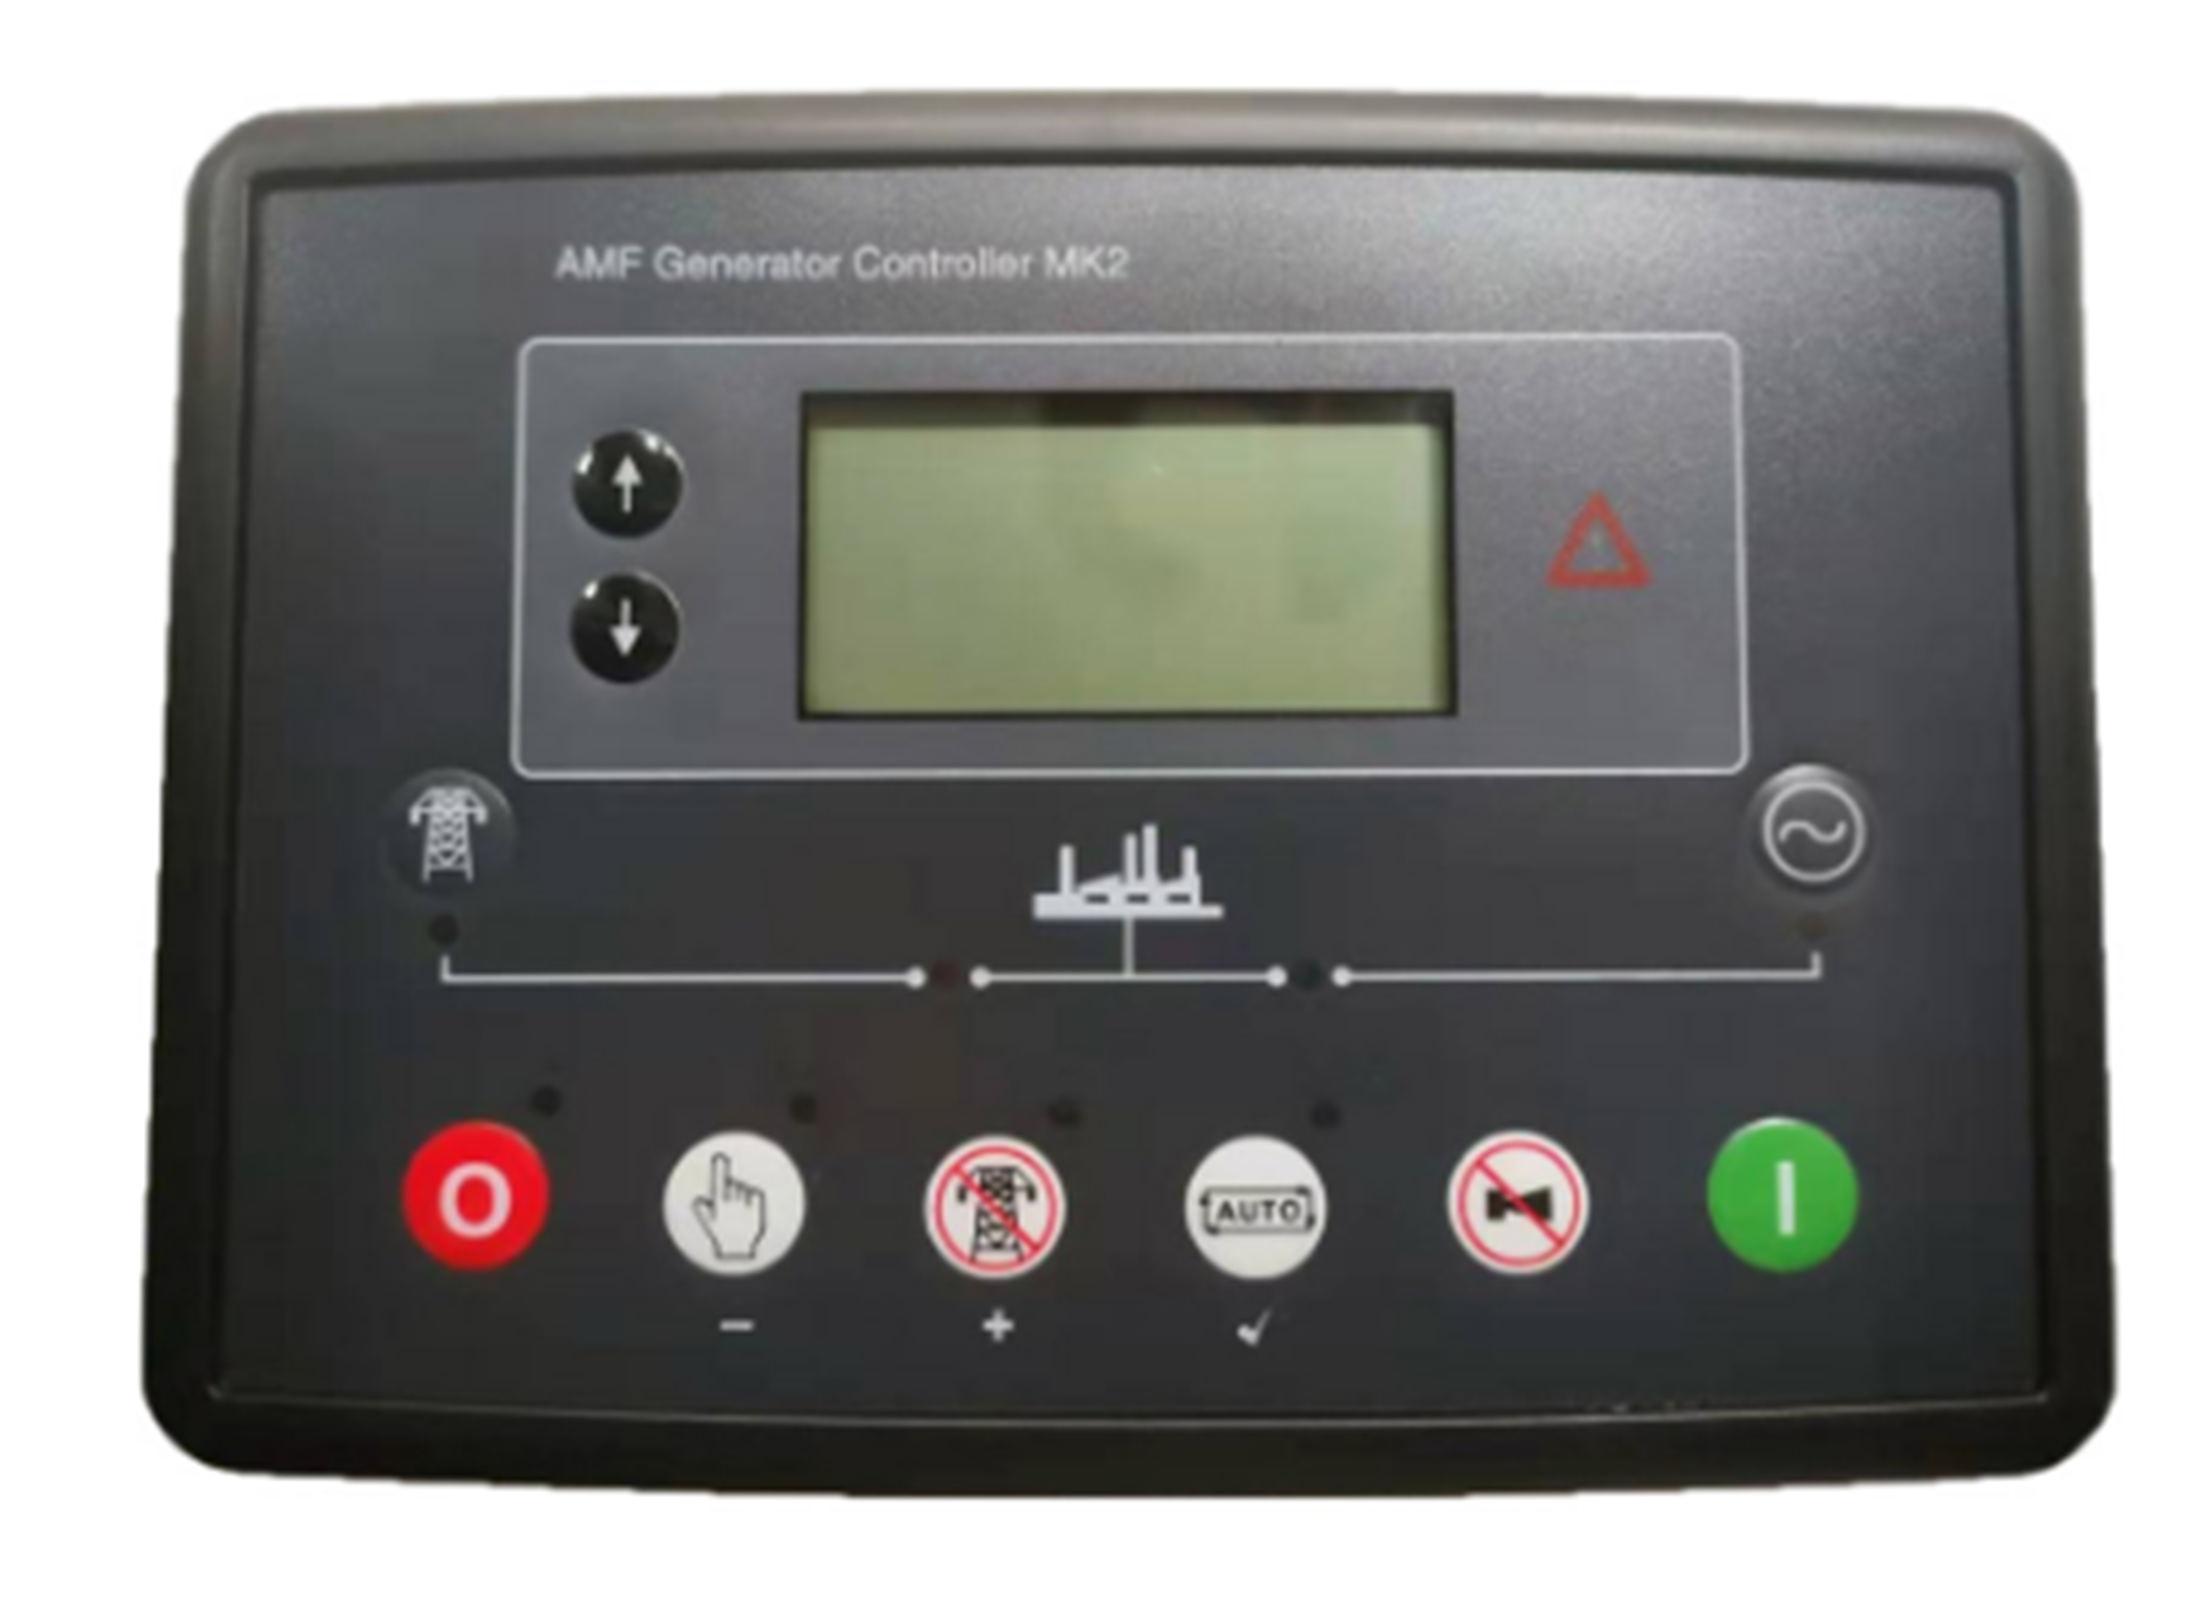 o controlador automatico do motor diesel amf dse6020 substitui o modulo do controlador do gerador dse6020